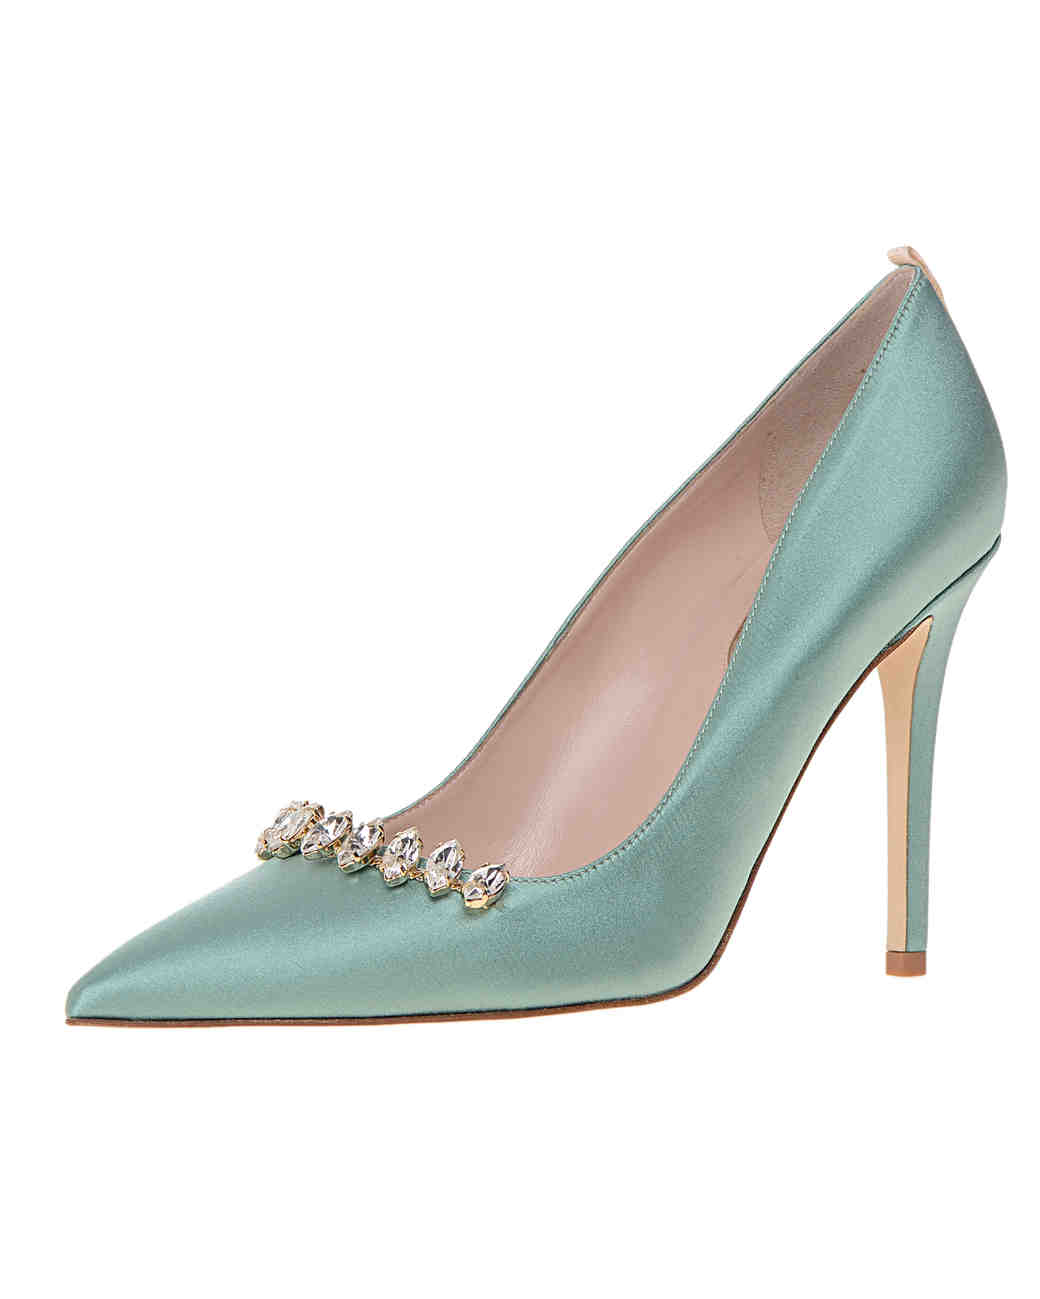 sjp-bridal-shoes-valentina-0515.jpg